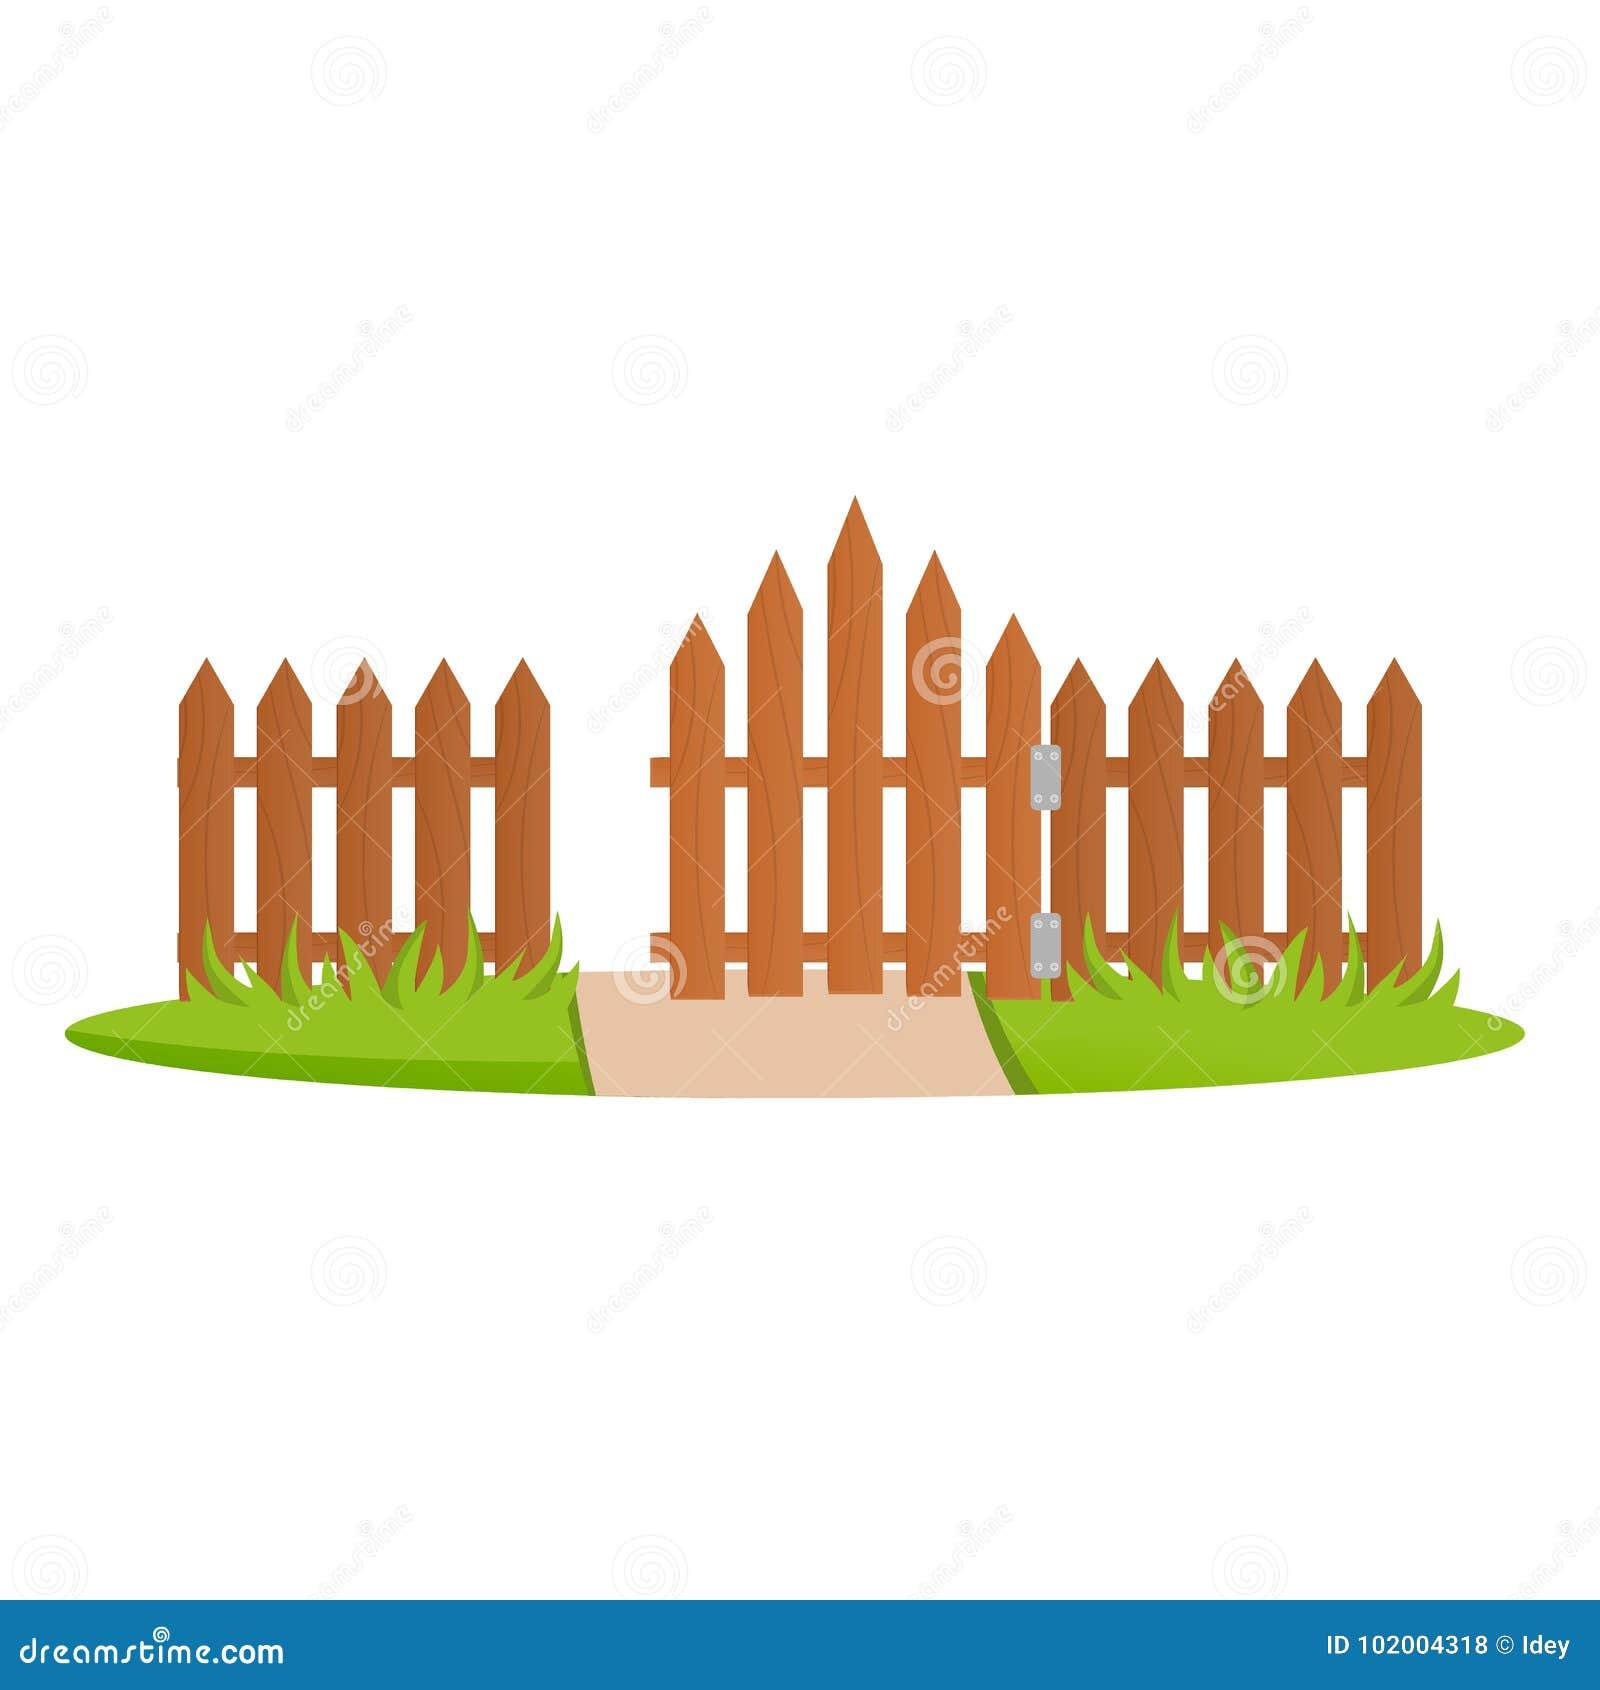 Decorative Wooden Fences Exterior Design Gates And